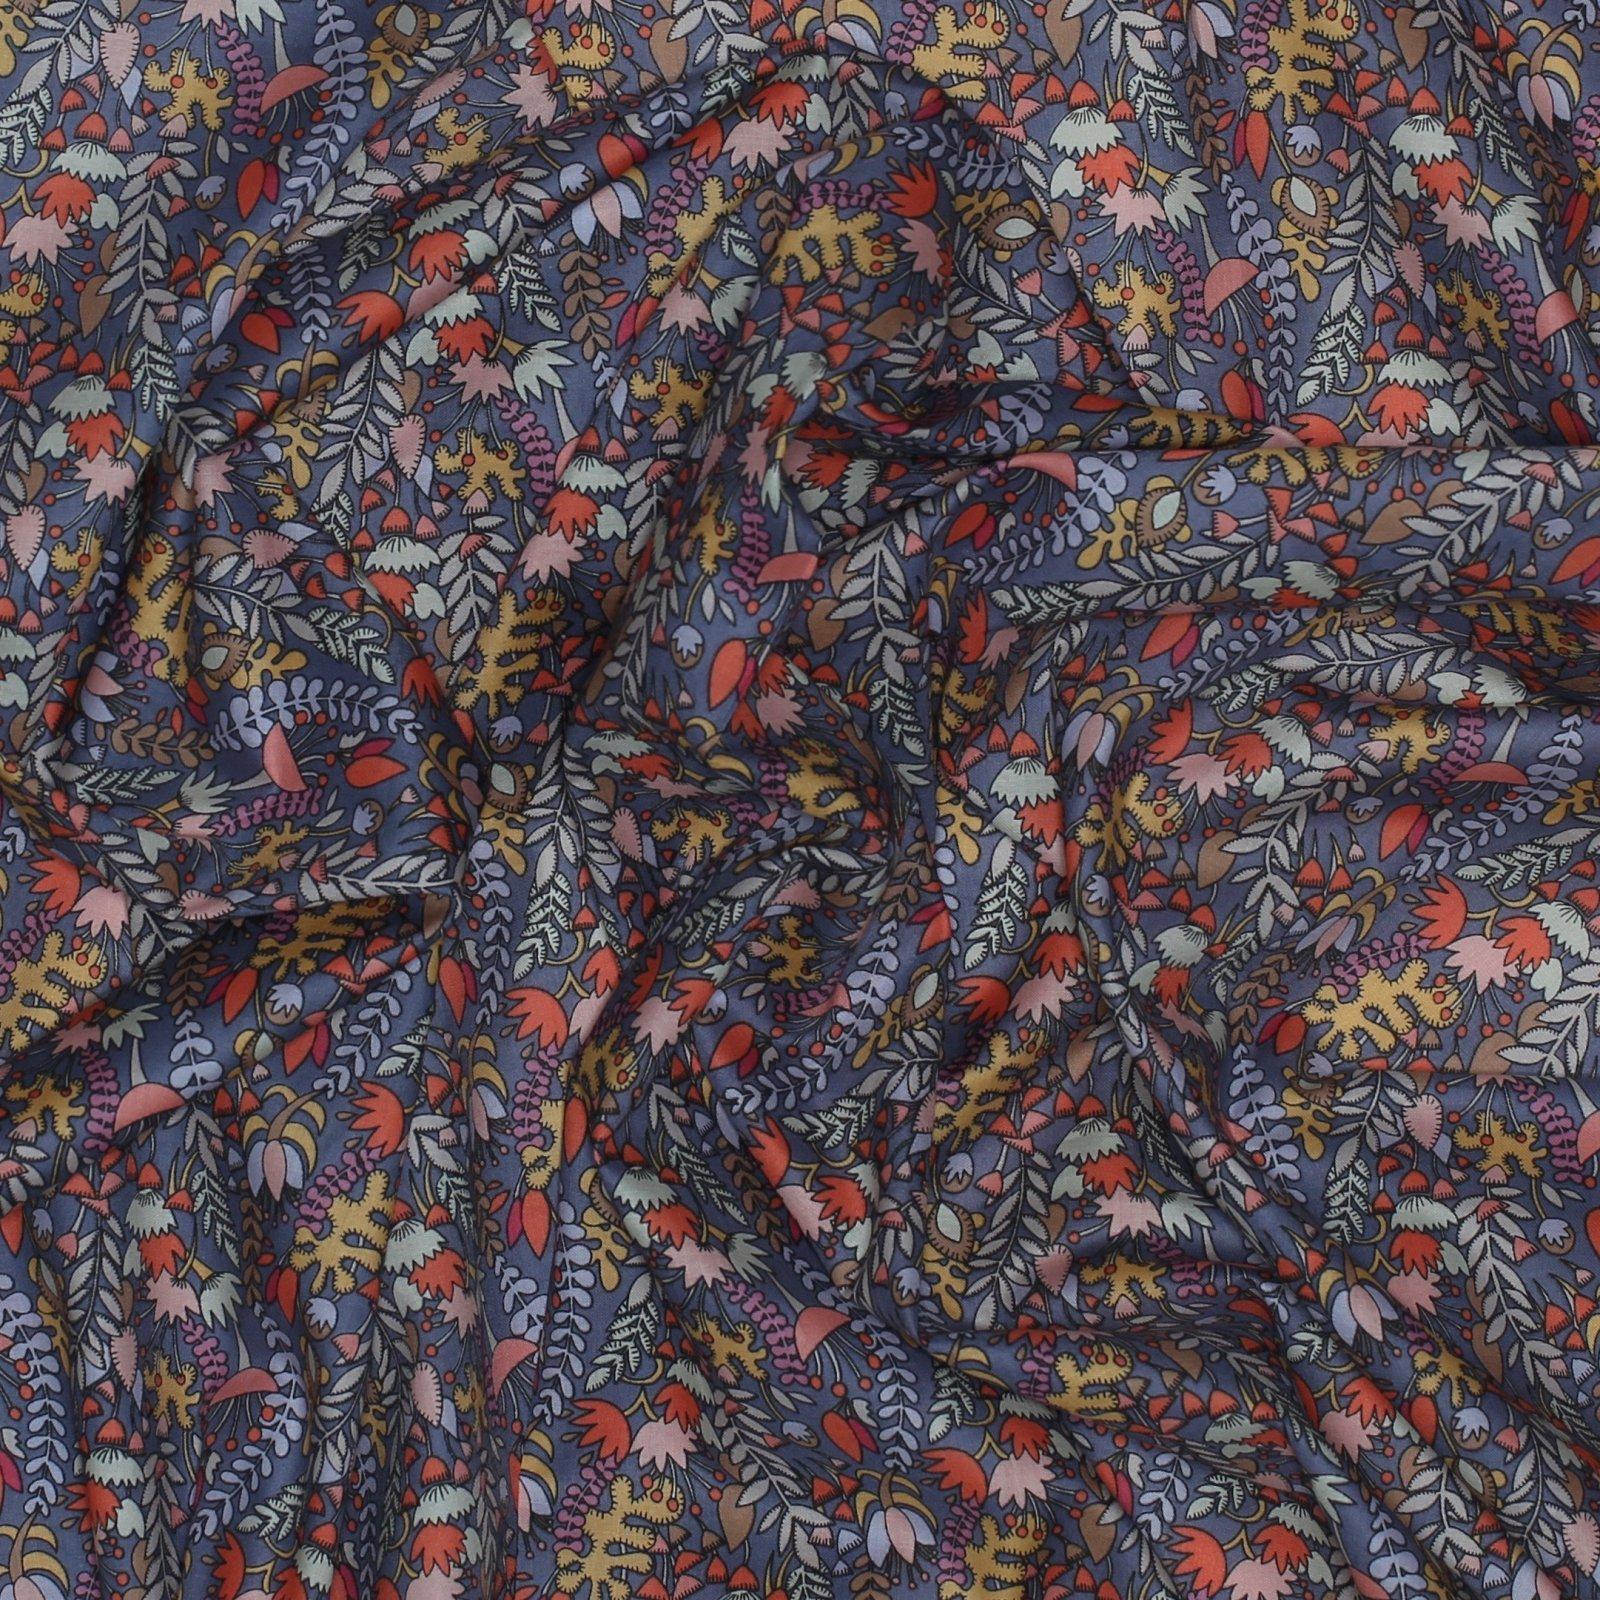 Floral Fantasy Cotton Lawn Fabric